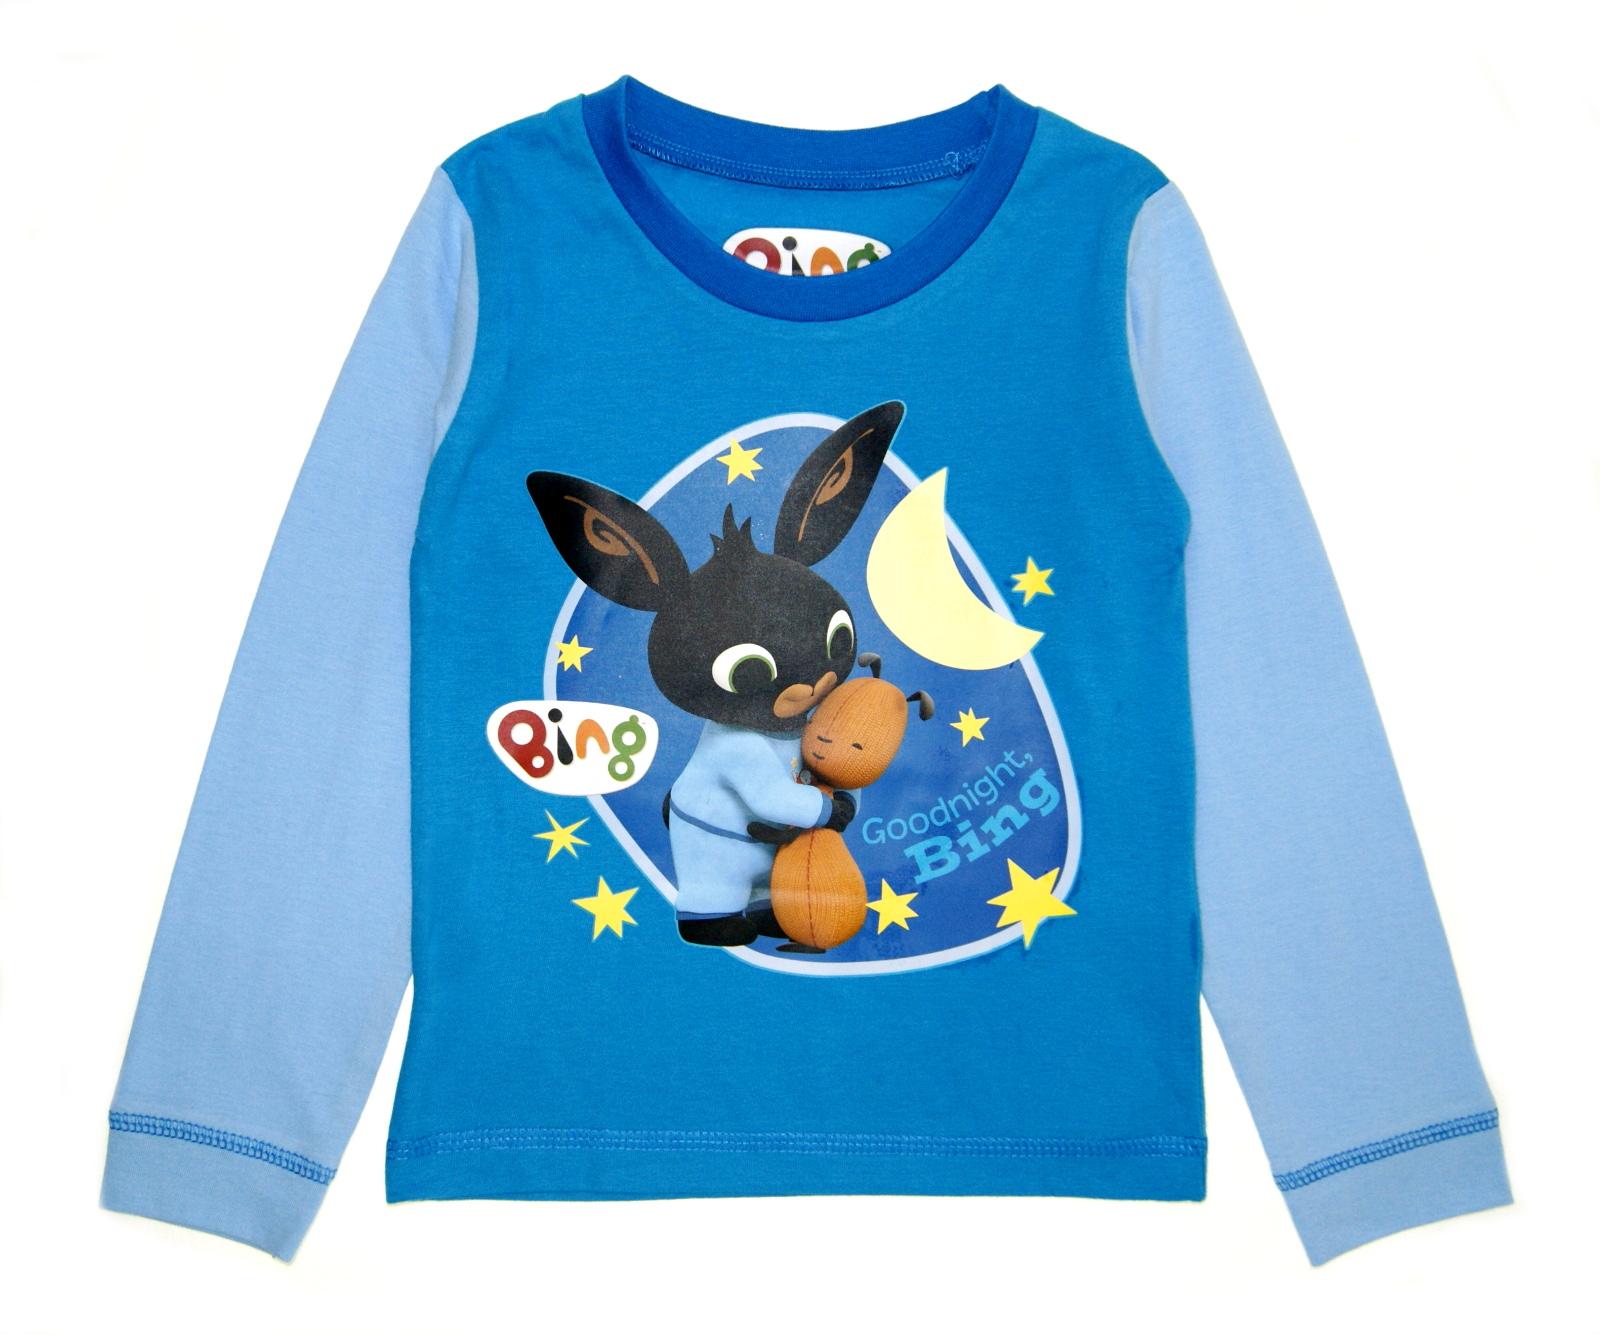 Cbeebies Bing Pyjamas Boys Girls Full Length Pjs Set Character 2 Piece Kids Size